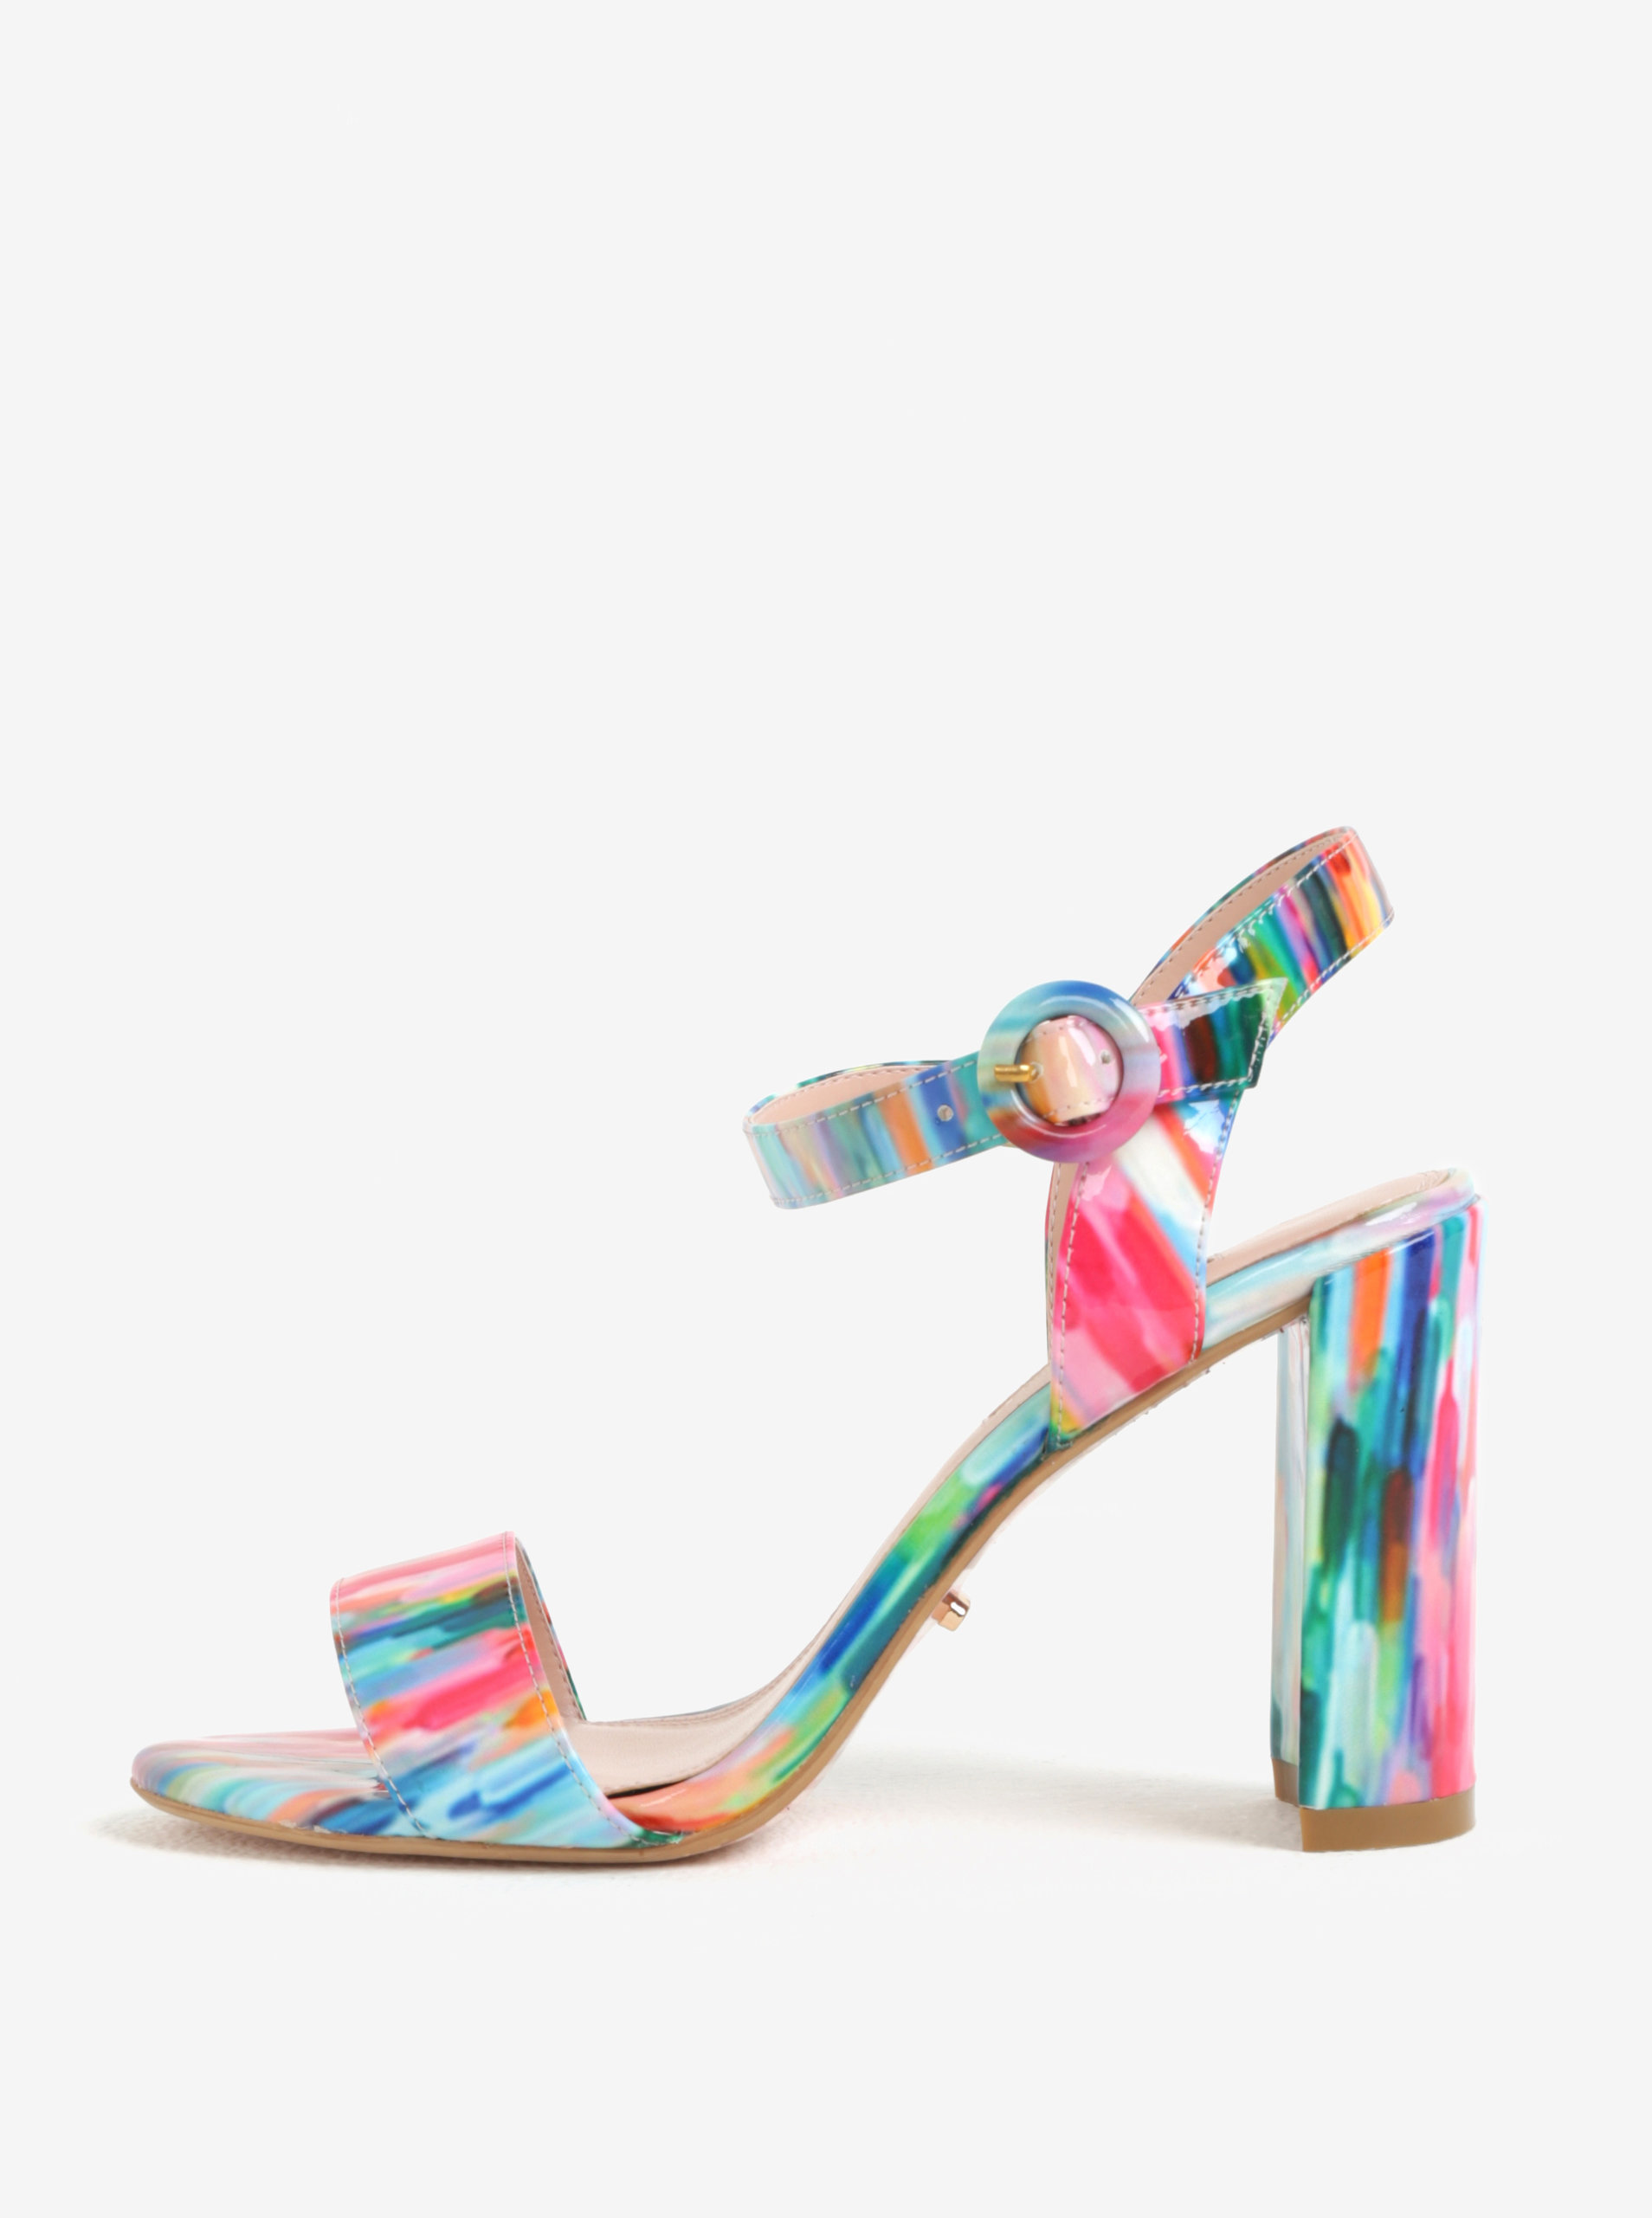 2857d8c2b Farebné sandálky na širokom podpätku Dune London Mixed | ZOOT.sk